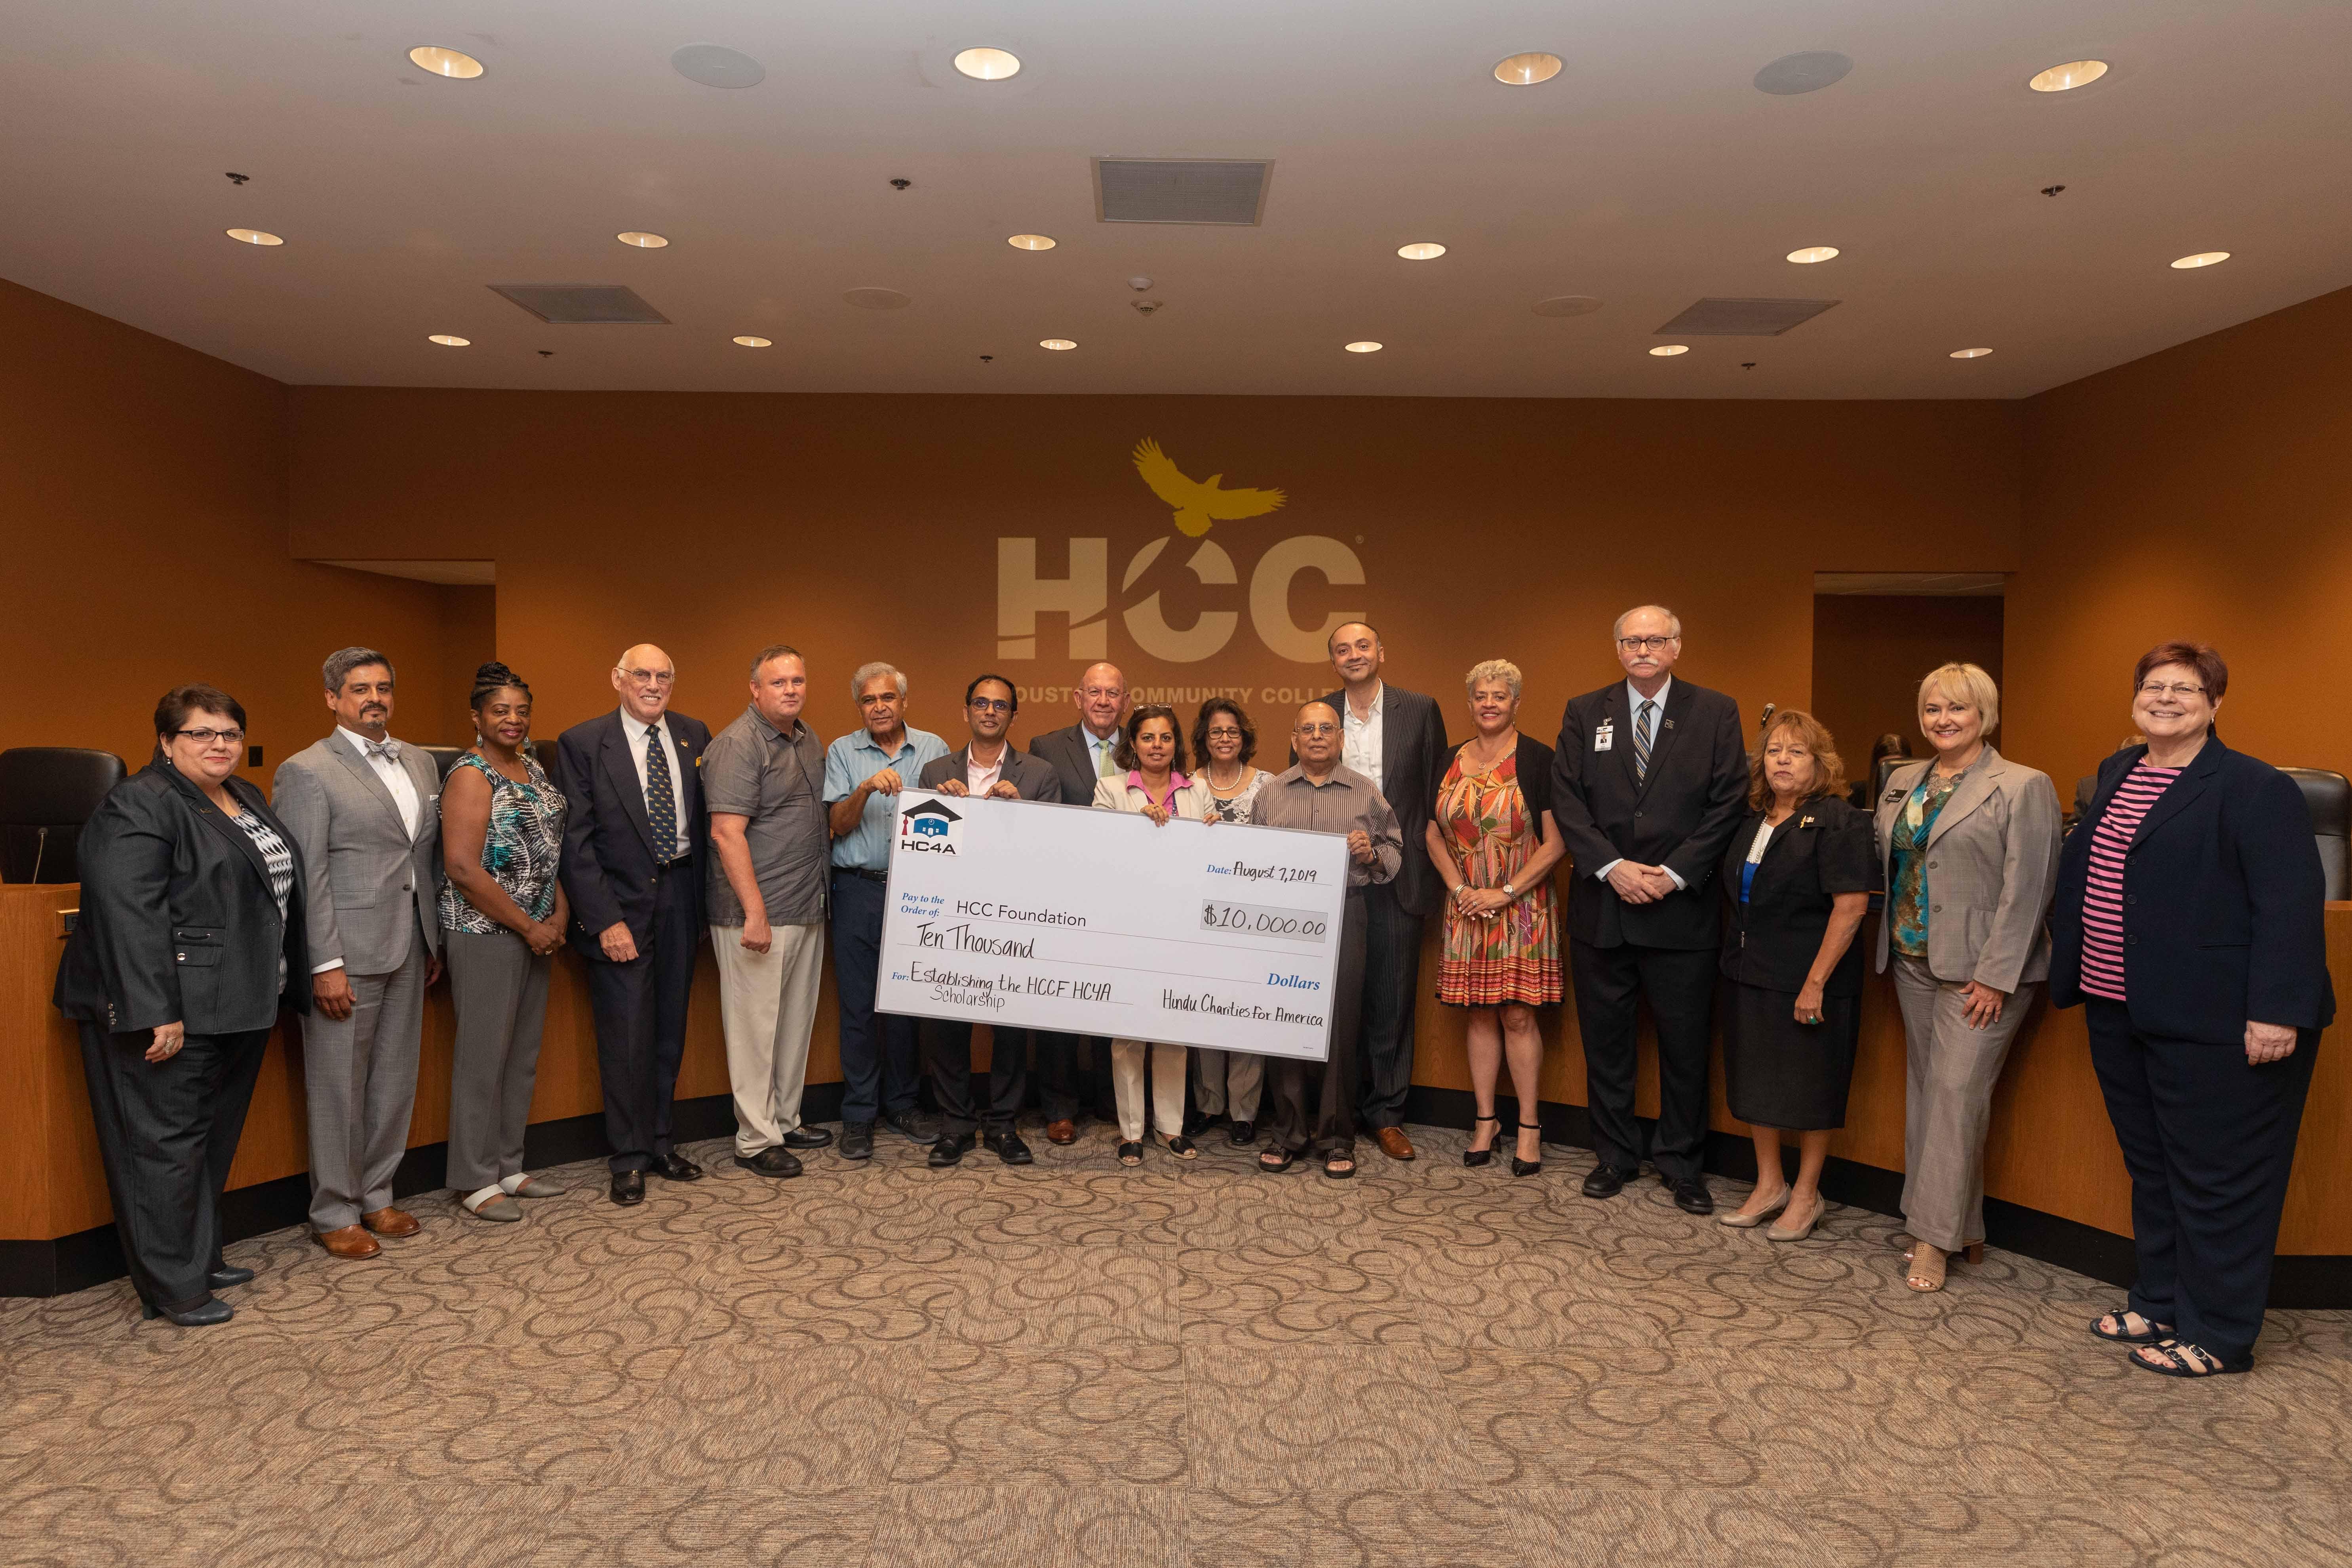 Houston Community College Foundation